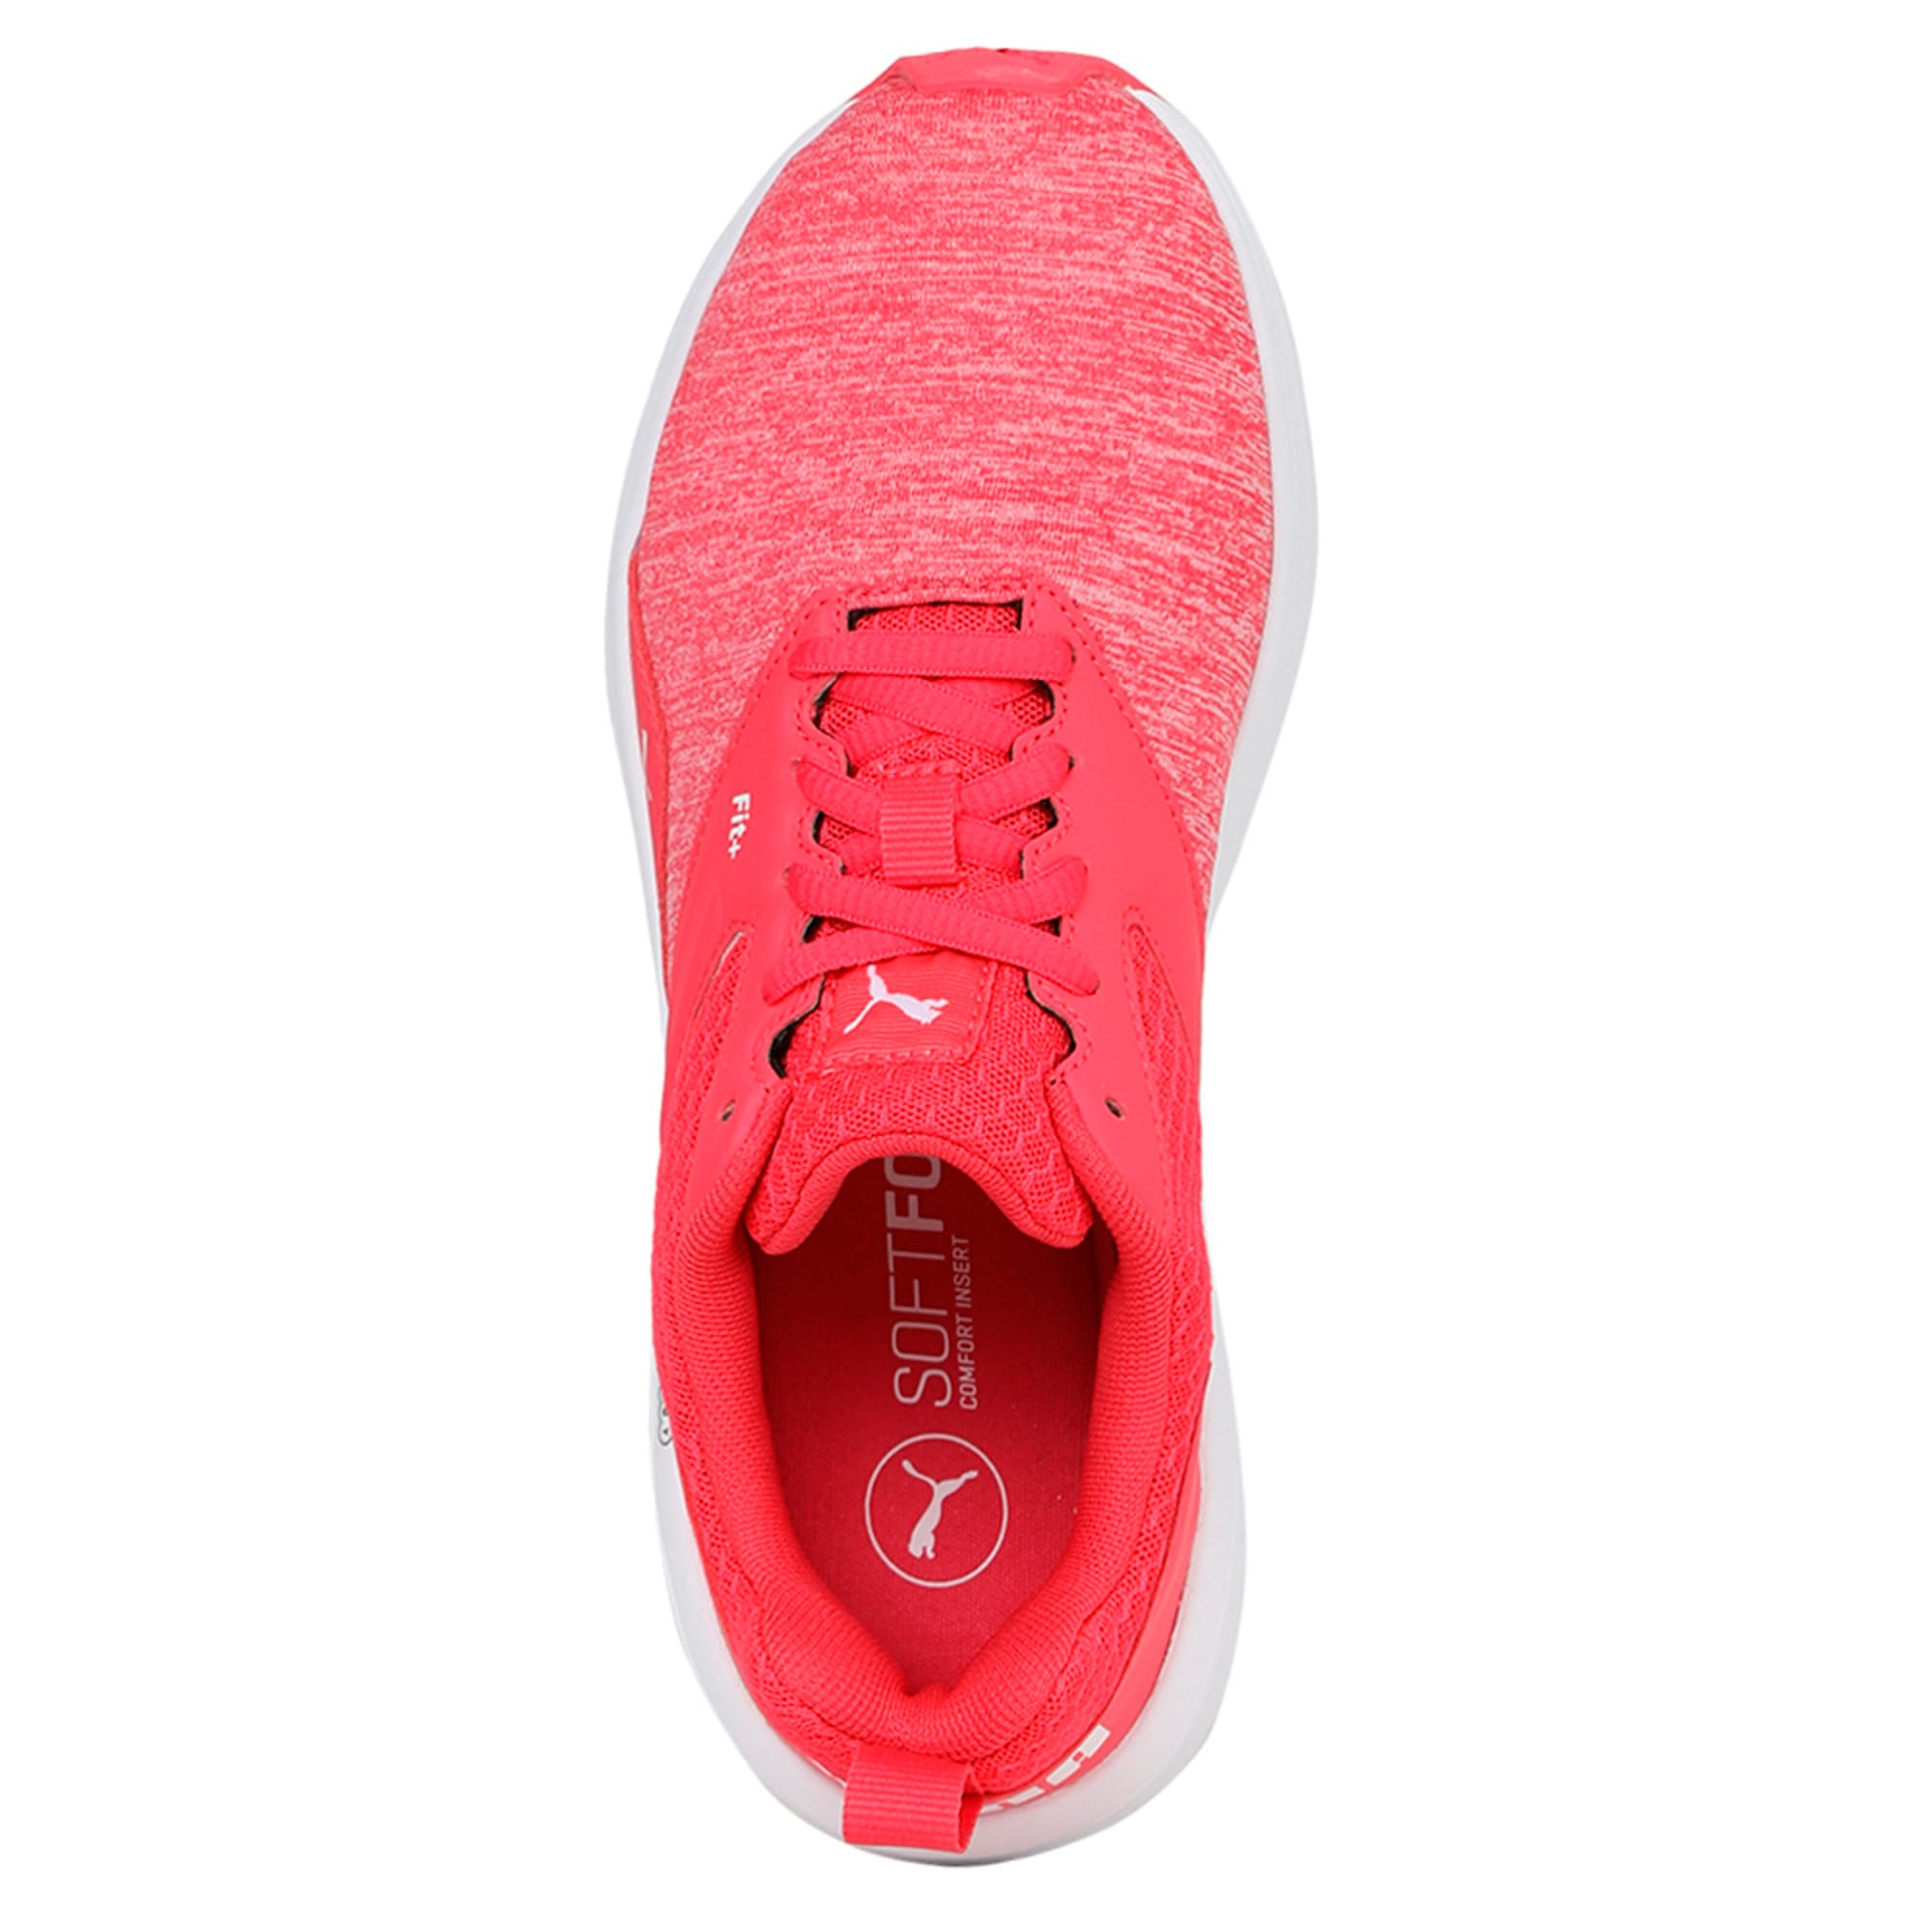 Thumbnail 3 of NRGY Comet Kids' Training Shoes, White-Paradise Pink-White, medium-IND